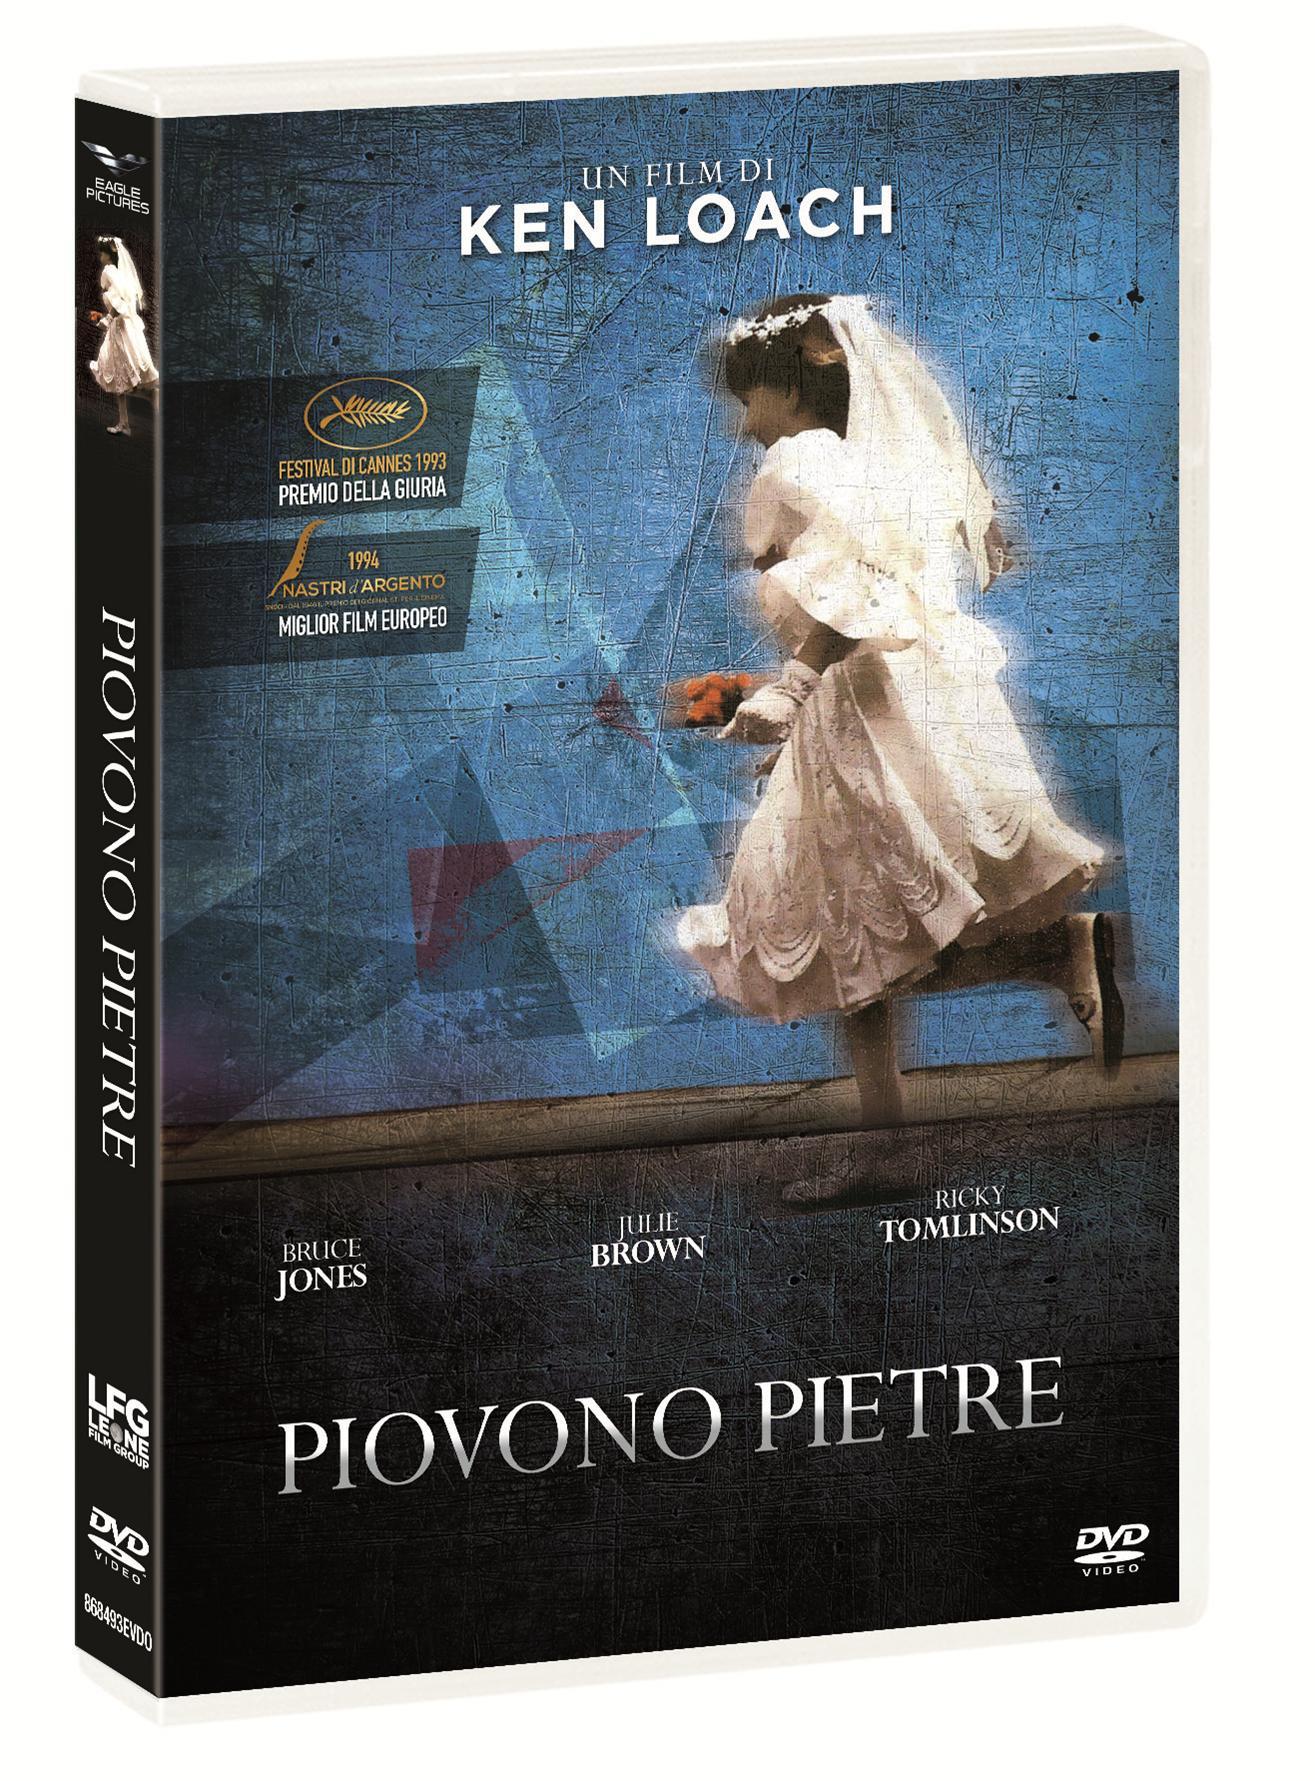 PIOVONO PIETRE (DVD)